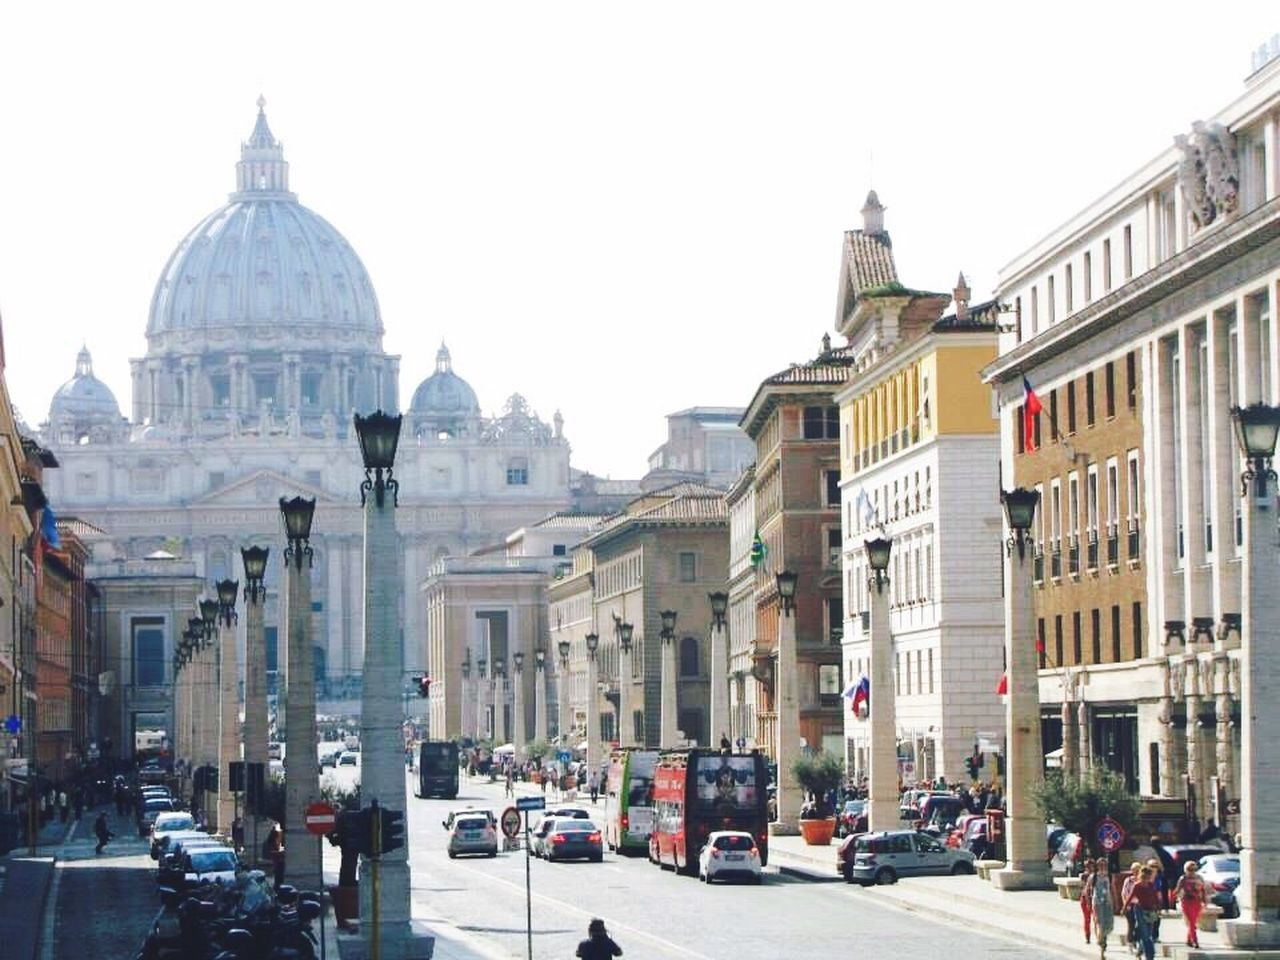 Rome Rome Italy Vatican VaticanCity Italy Italia Building Exterior Travel Destinations City Architecture Street Travel Dome City Life Road Built Structure